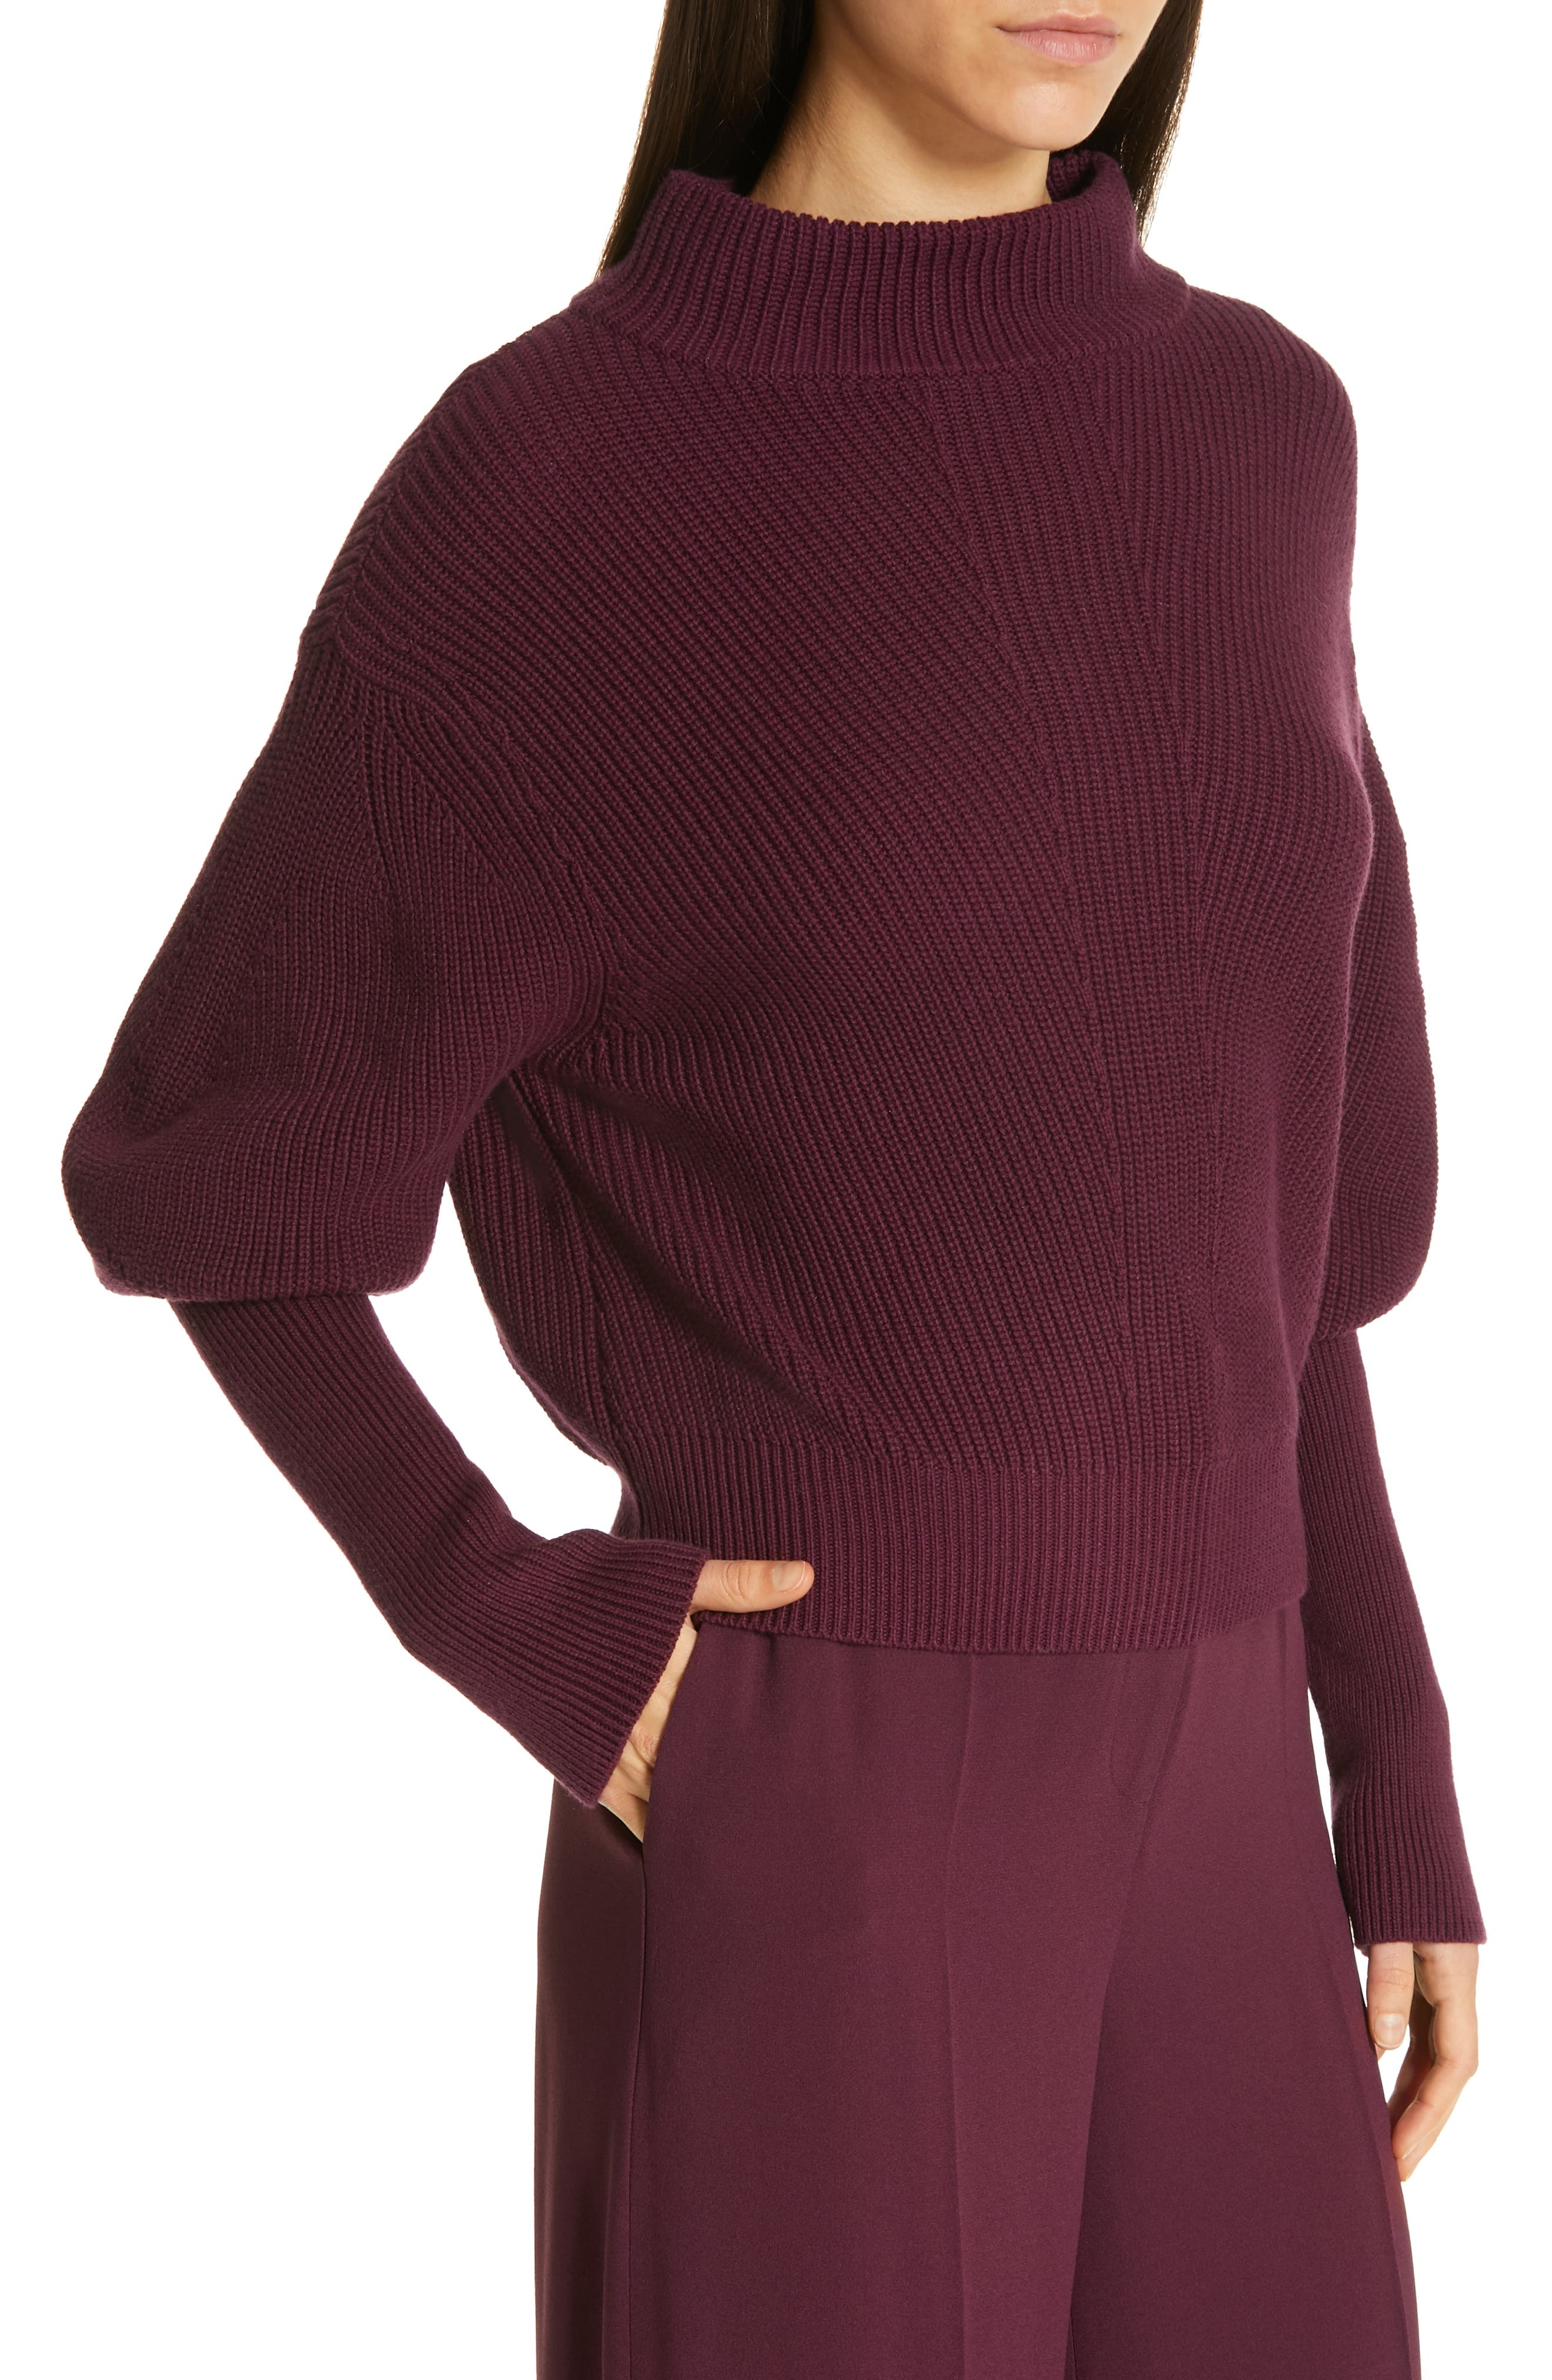 Flix Balloon Sleeve Sweater,                             Alternate thumbnail 4, color,                             DARK BERRY